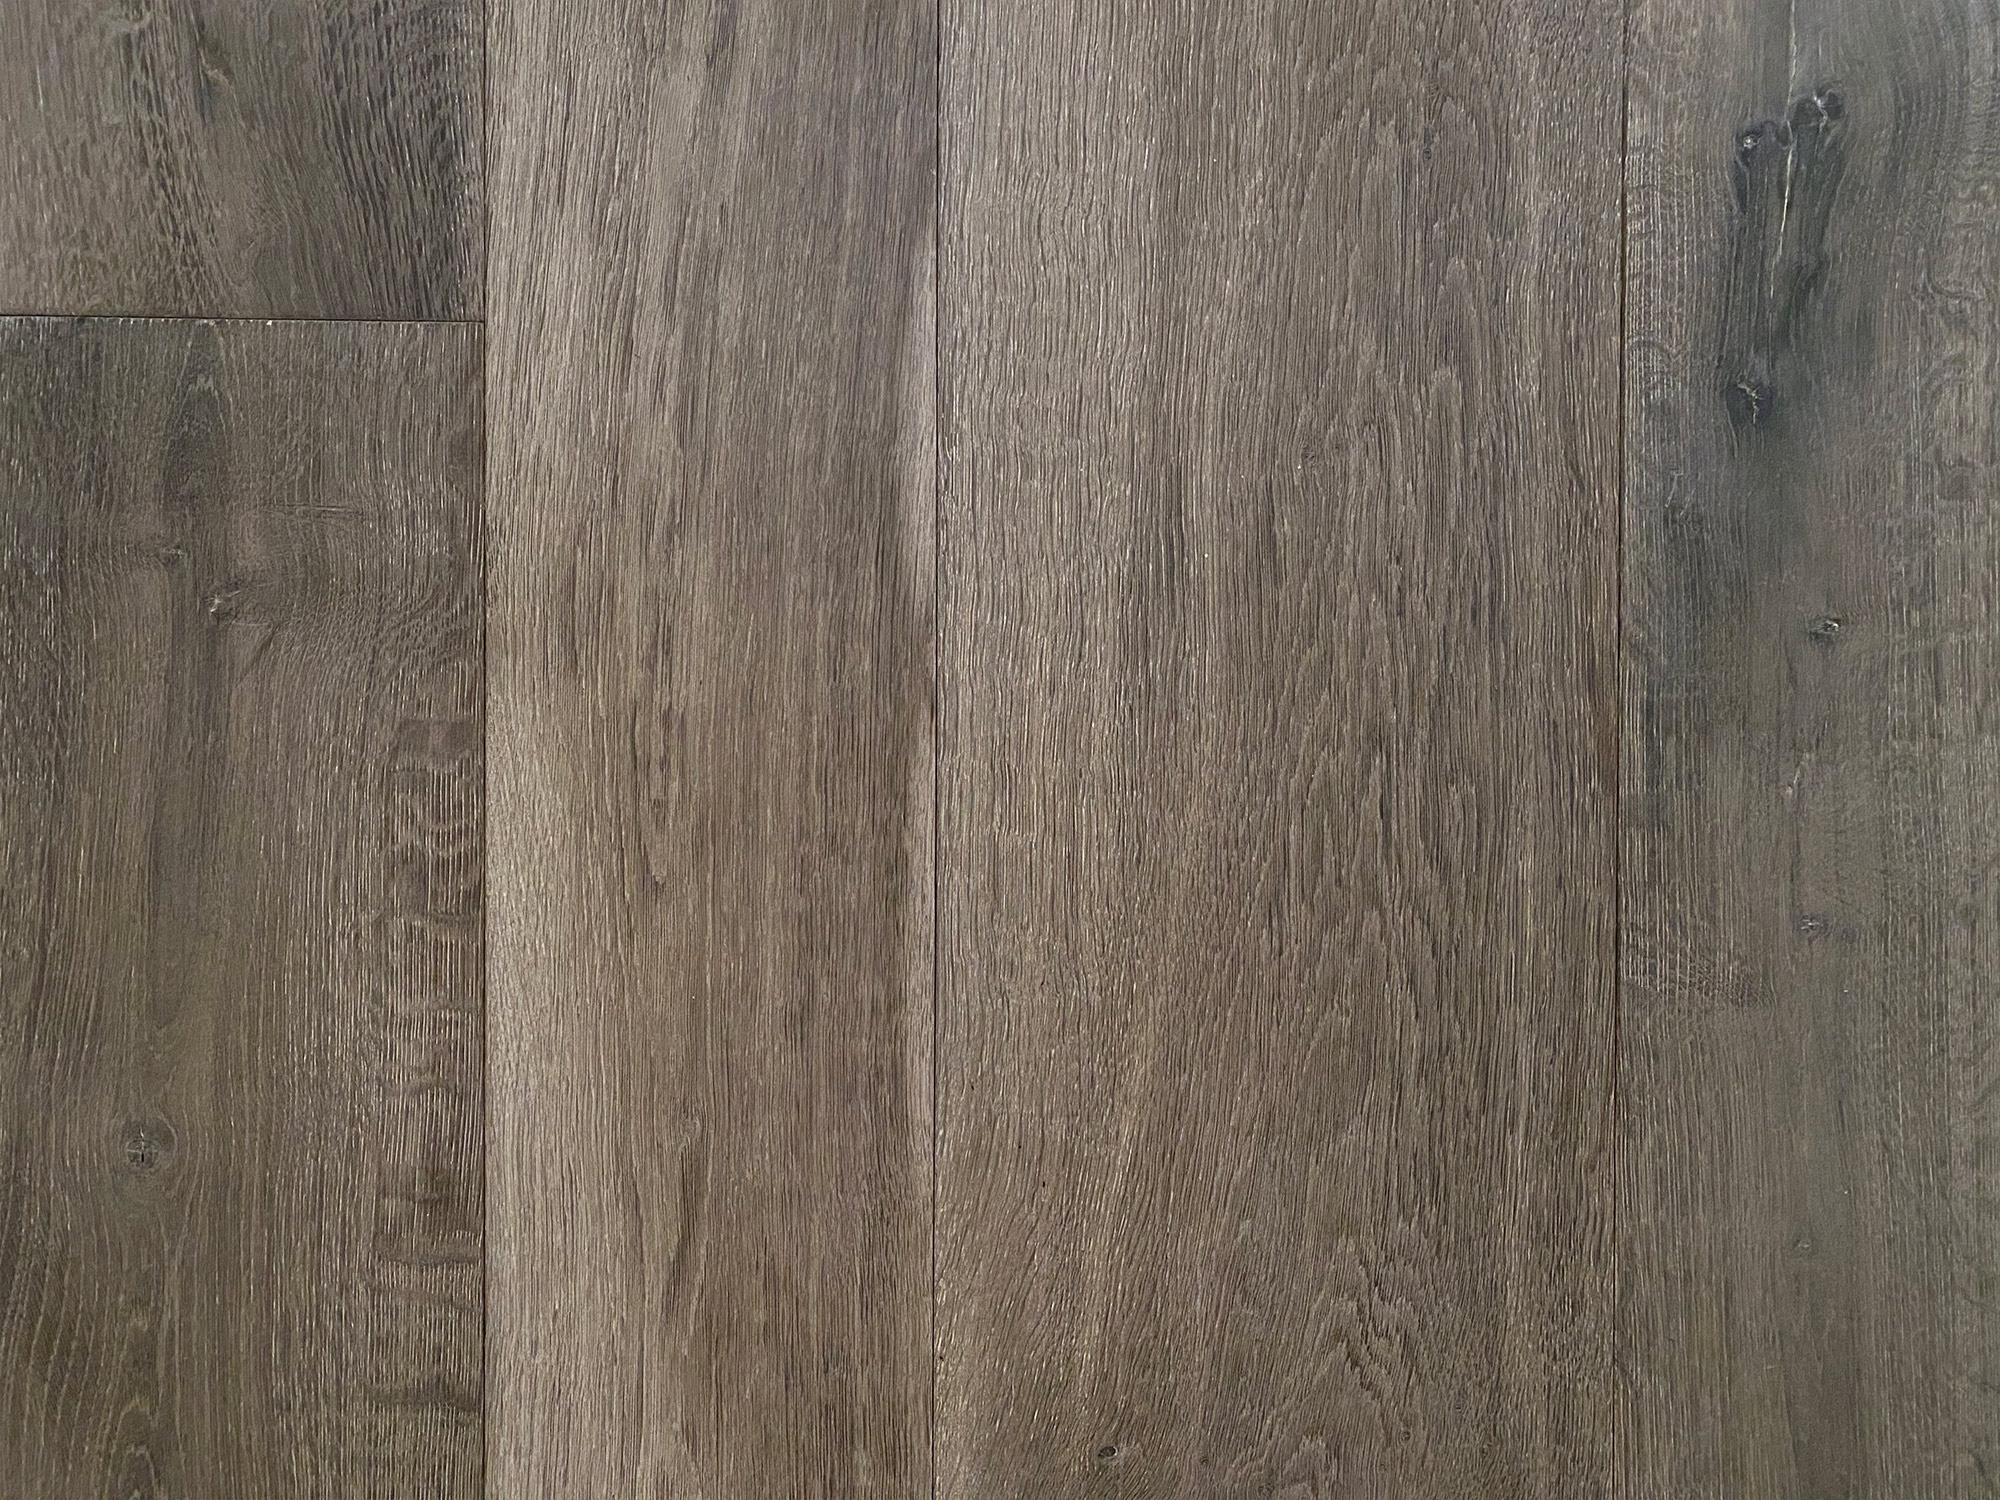 Dark grey engineered flooring sample board